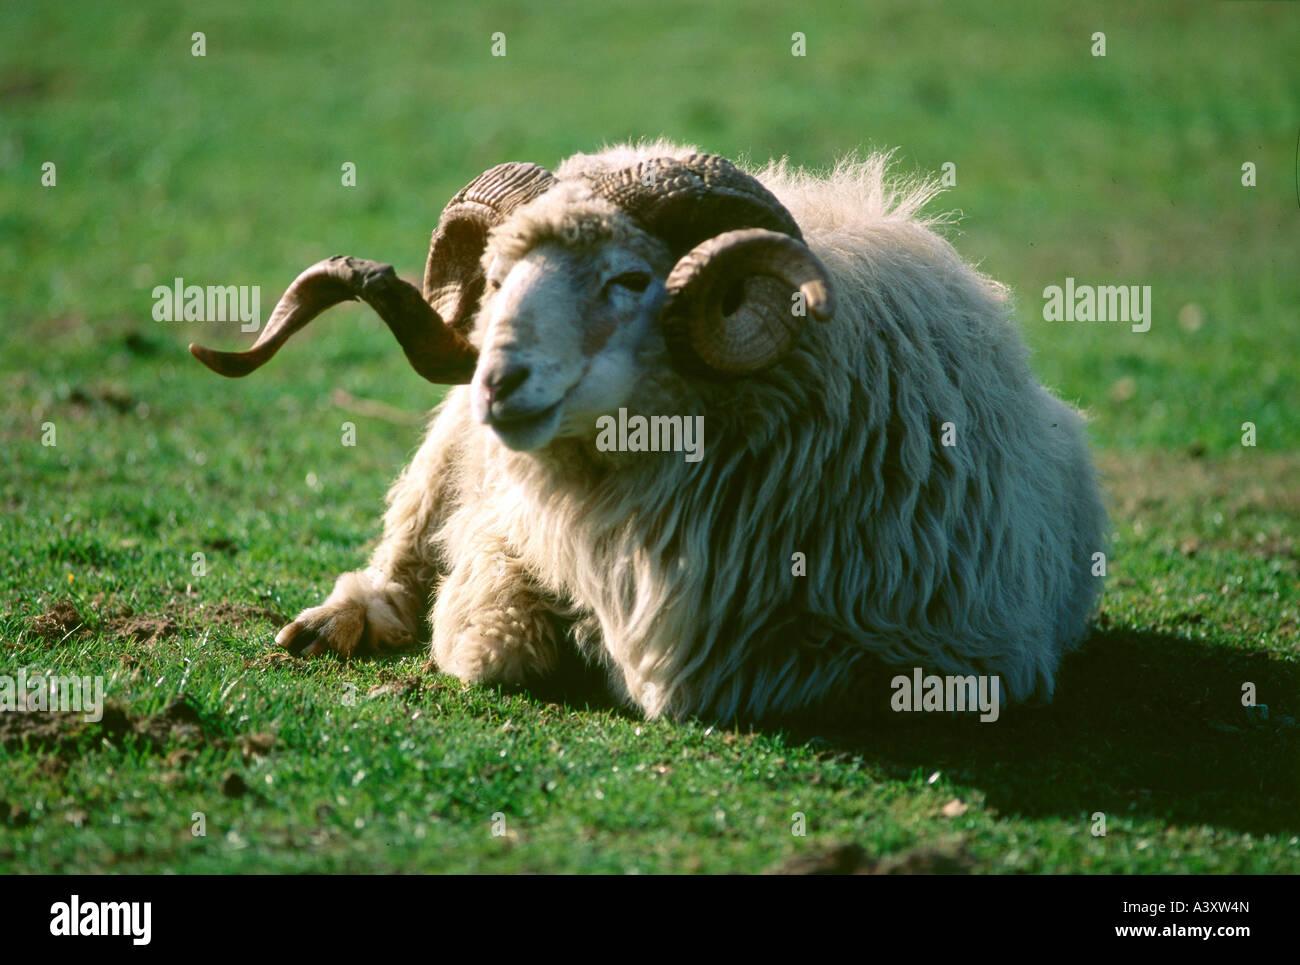 zoology / animals, mammal / mammalian, sheep, (Ovis), Walachian sheep, lying on meadow, distribution: Slovakia, - Stock Image